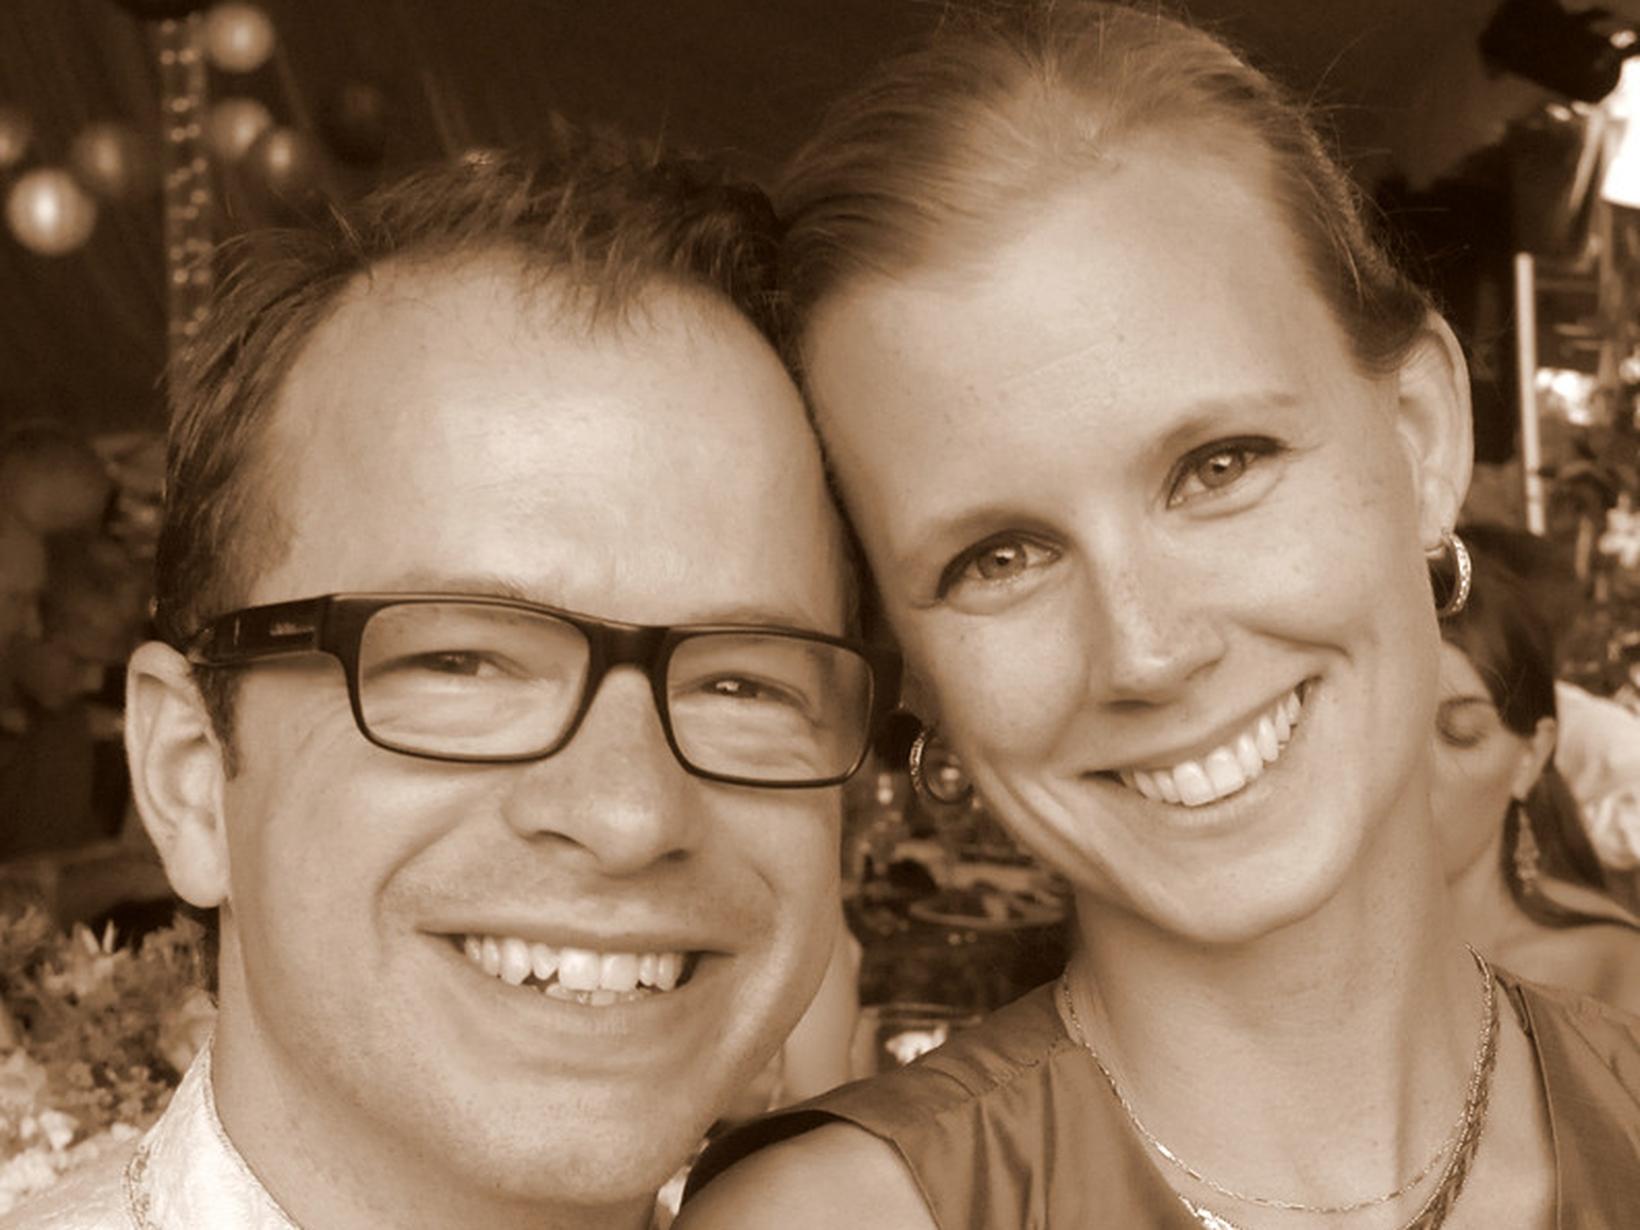 Bendigo & Jennifer from Wilmington, Delaware, United States